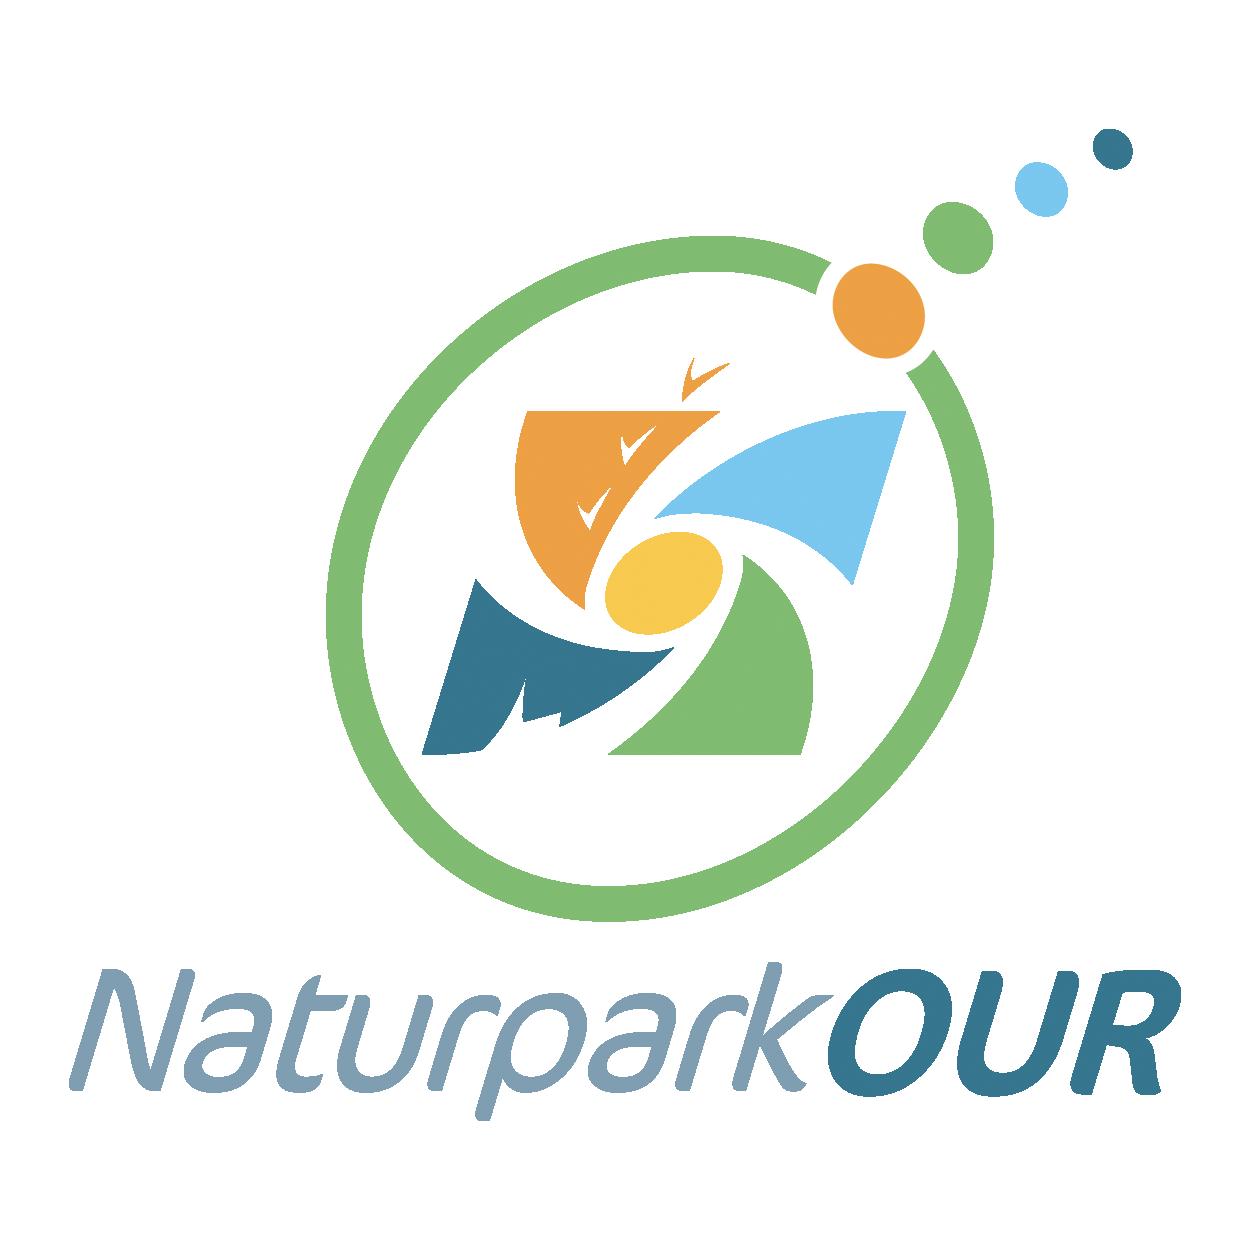 Naturpark Our Logo